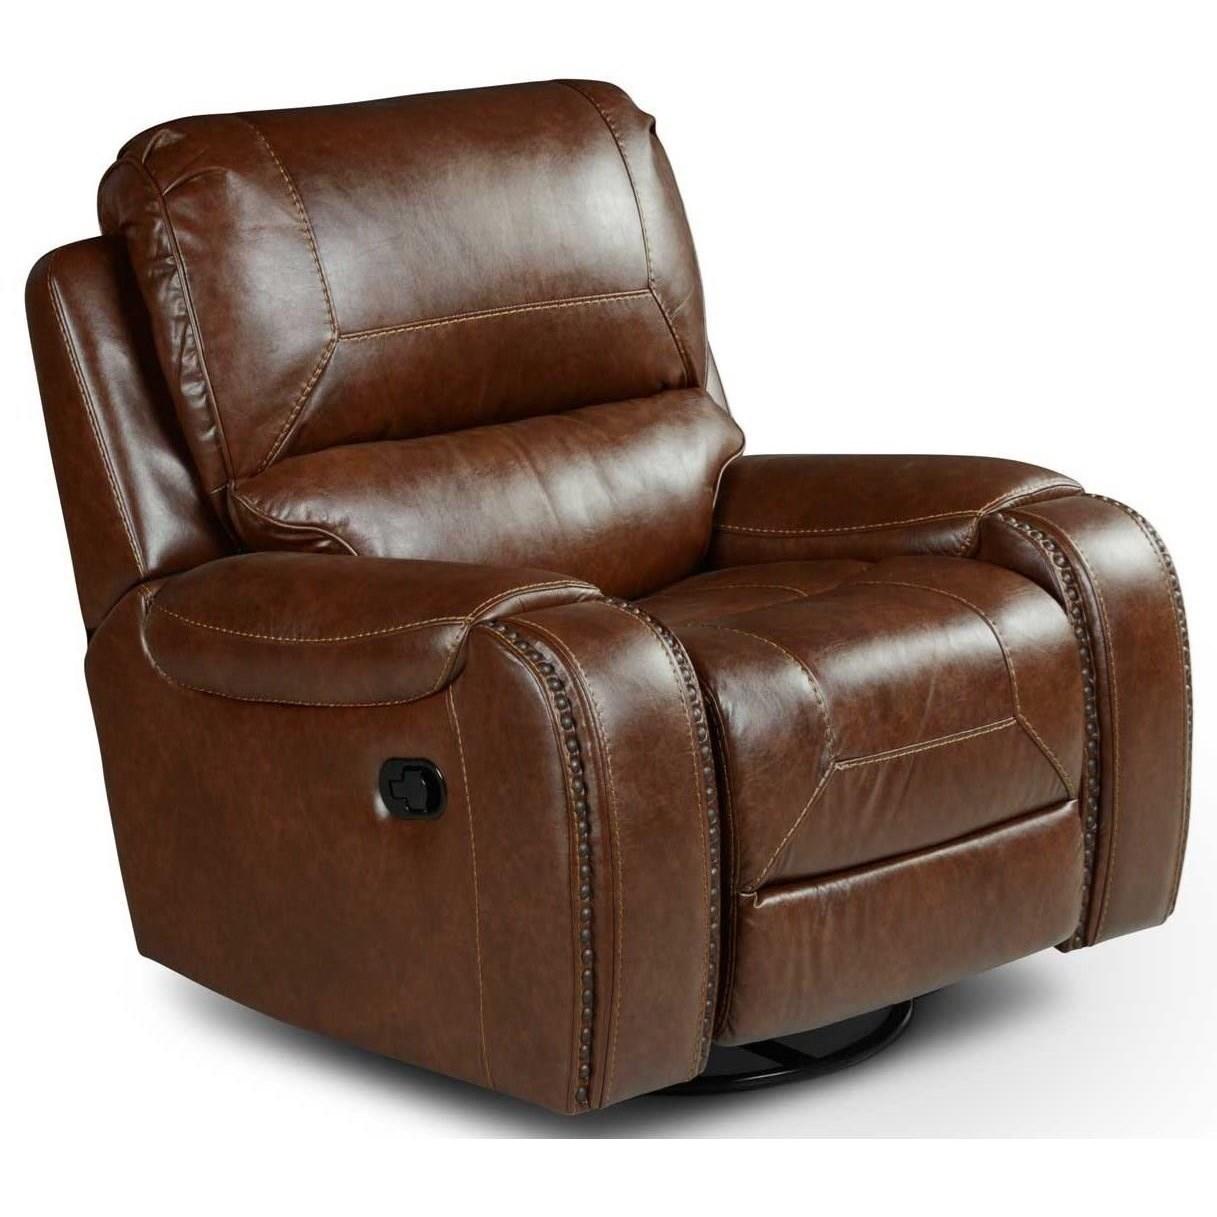 Steve Silver Keily Ke800c Manual Motion Swivel Glider Recliner Chair Sam Levitz Furniture Recliners